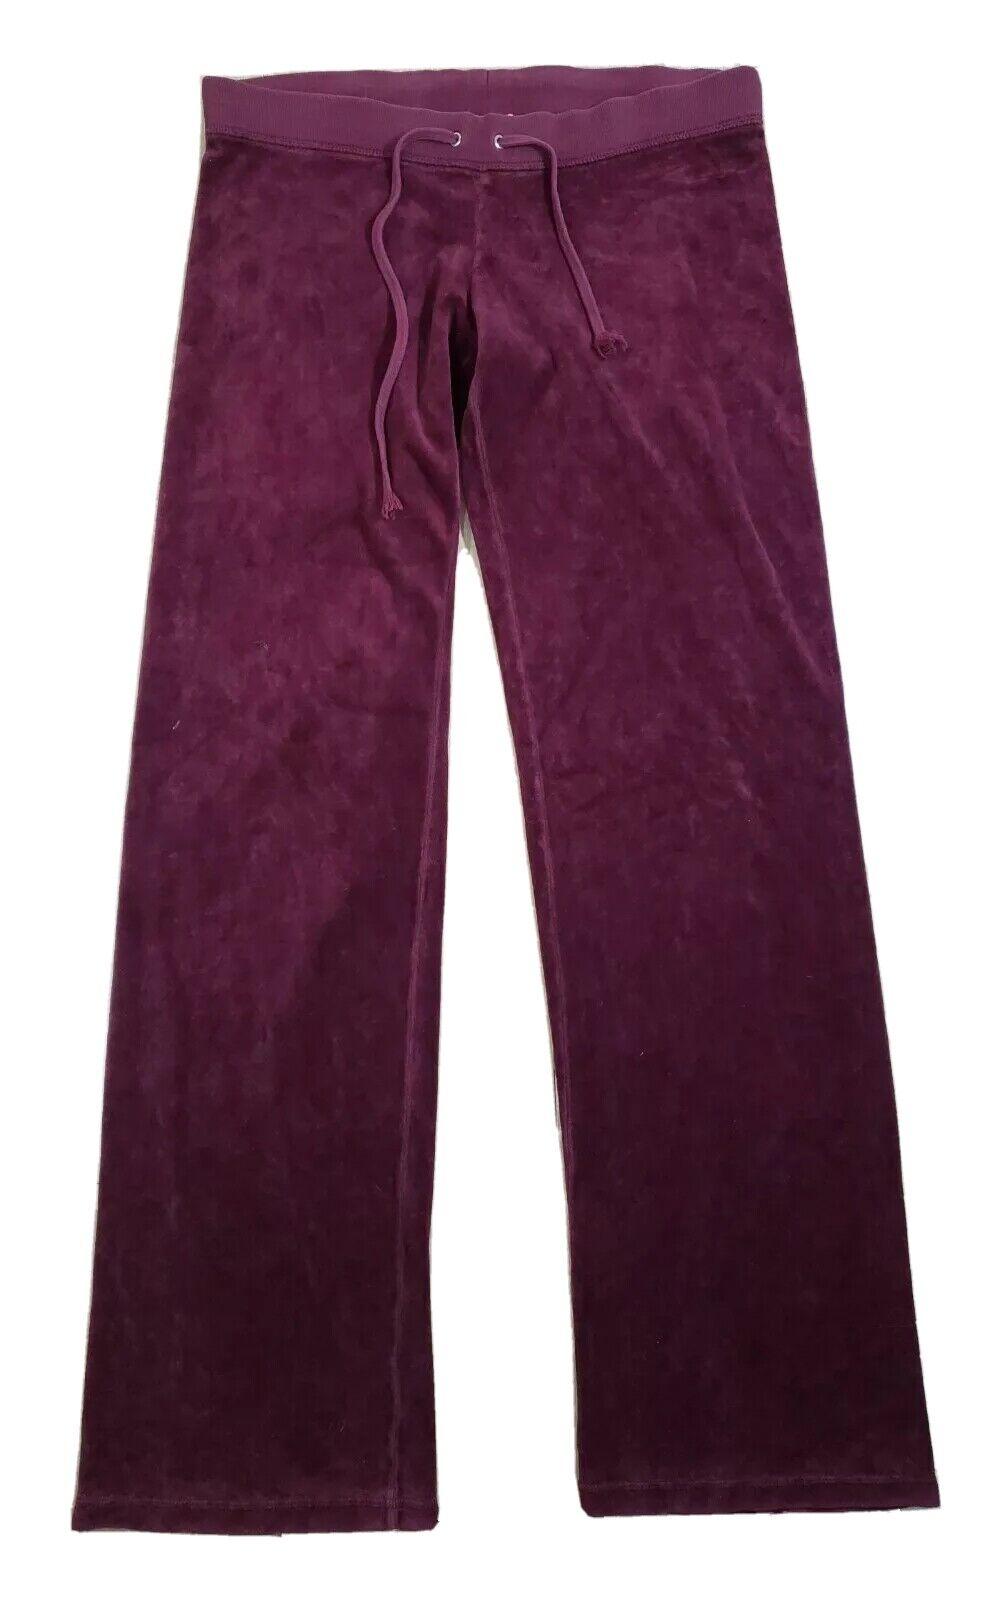 Vintage Juicy Couture Velour Petite Track Pants Purple Y2K Drawstring